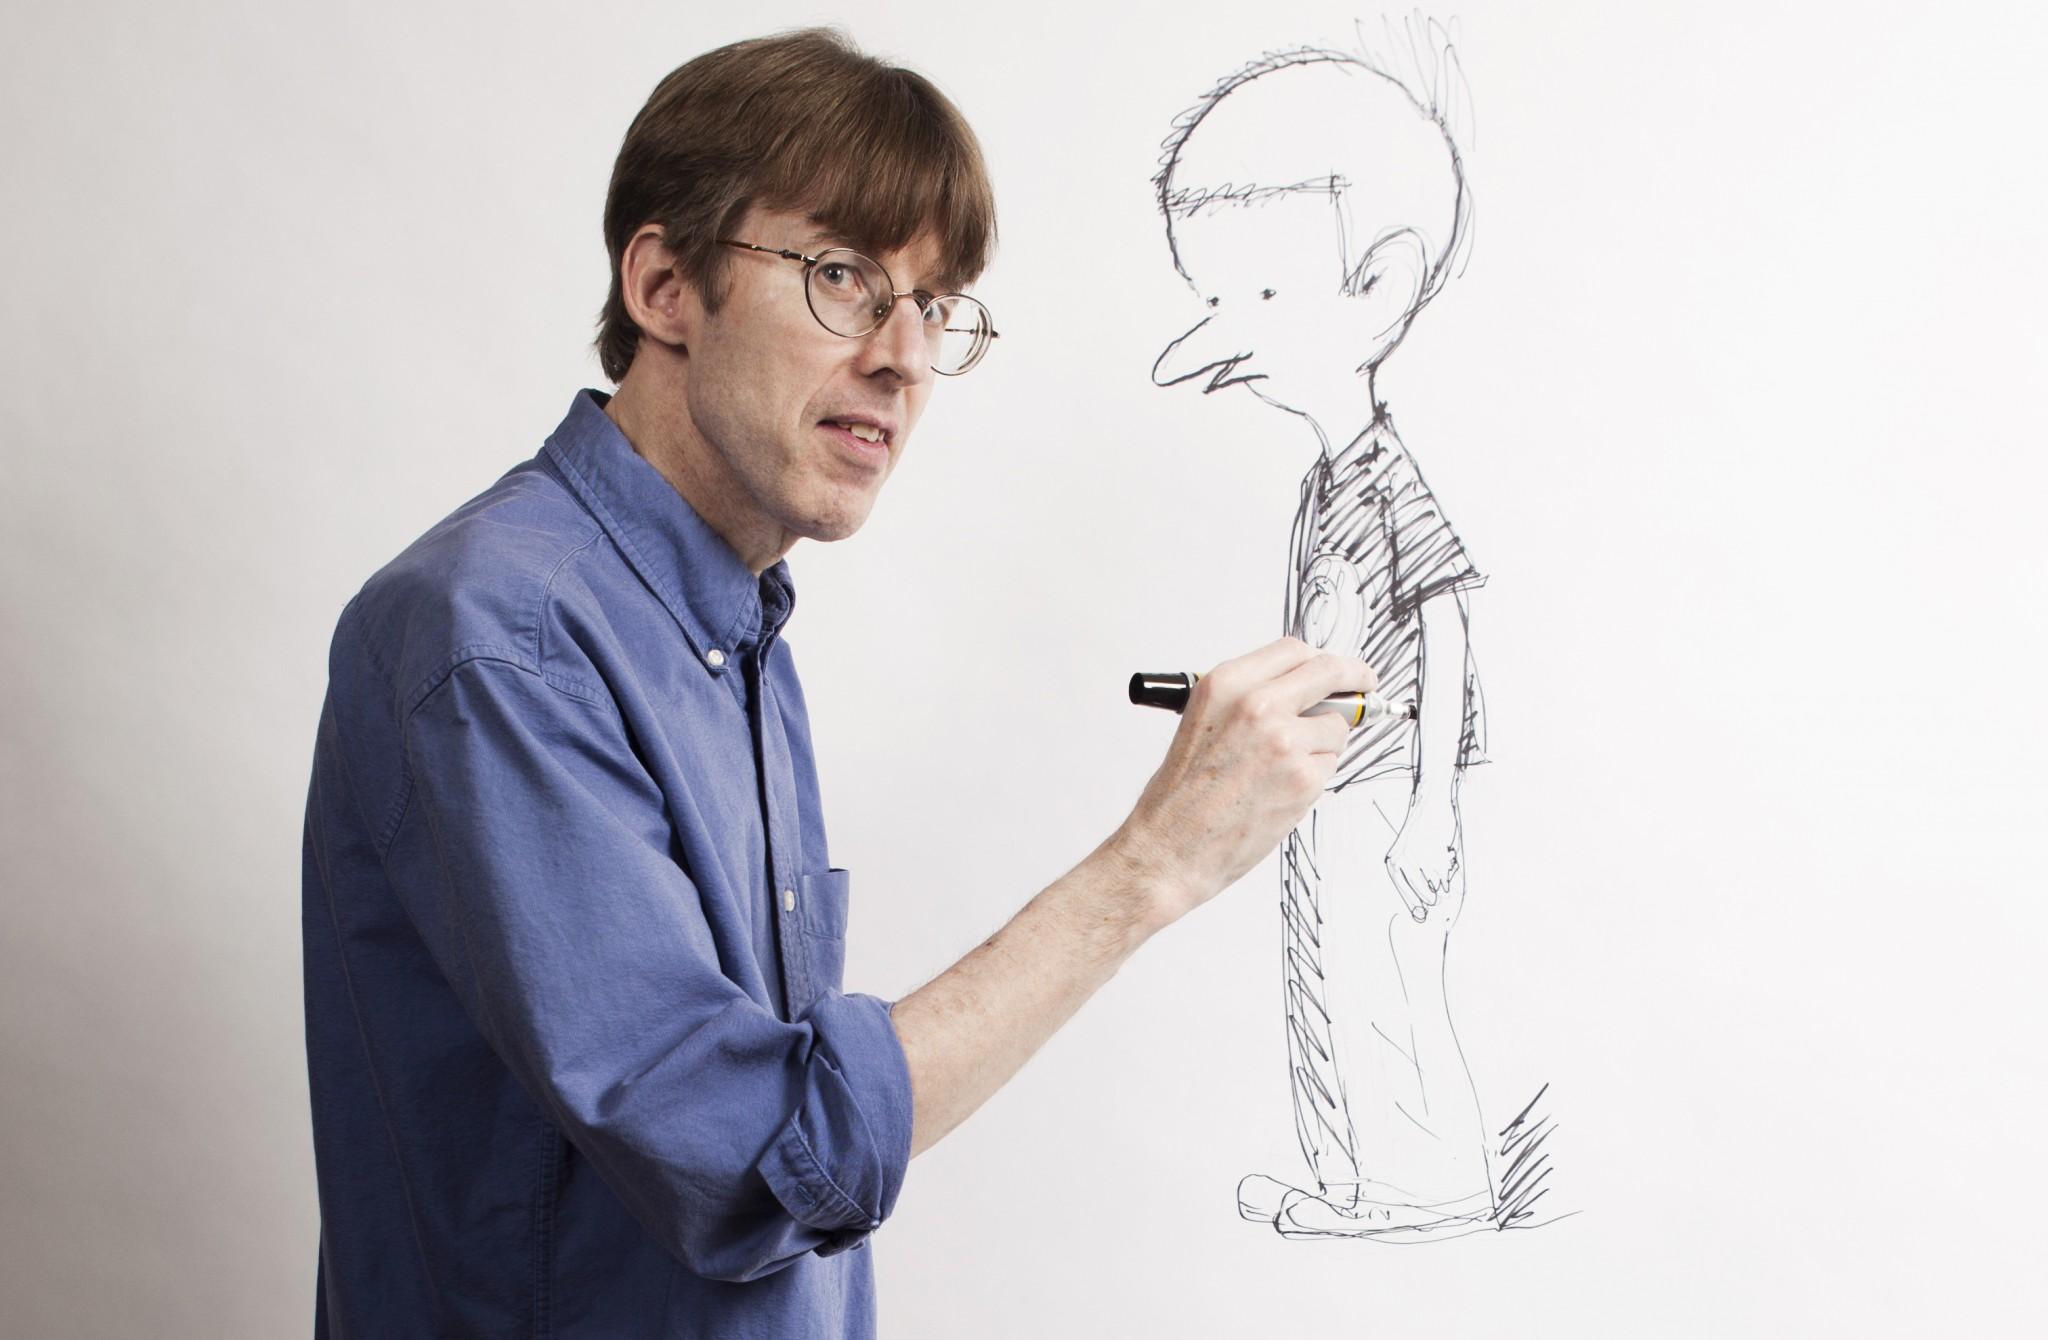 Richard Thompson, creator of the comic strip Cul de Sac, sketches Petey at his home in Arlington, Va. in 2011. (Photo: Dustin Fenstermacher)